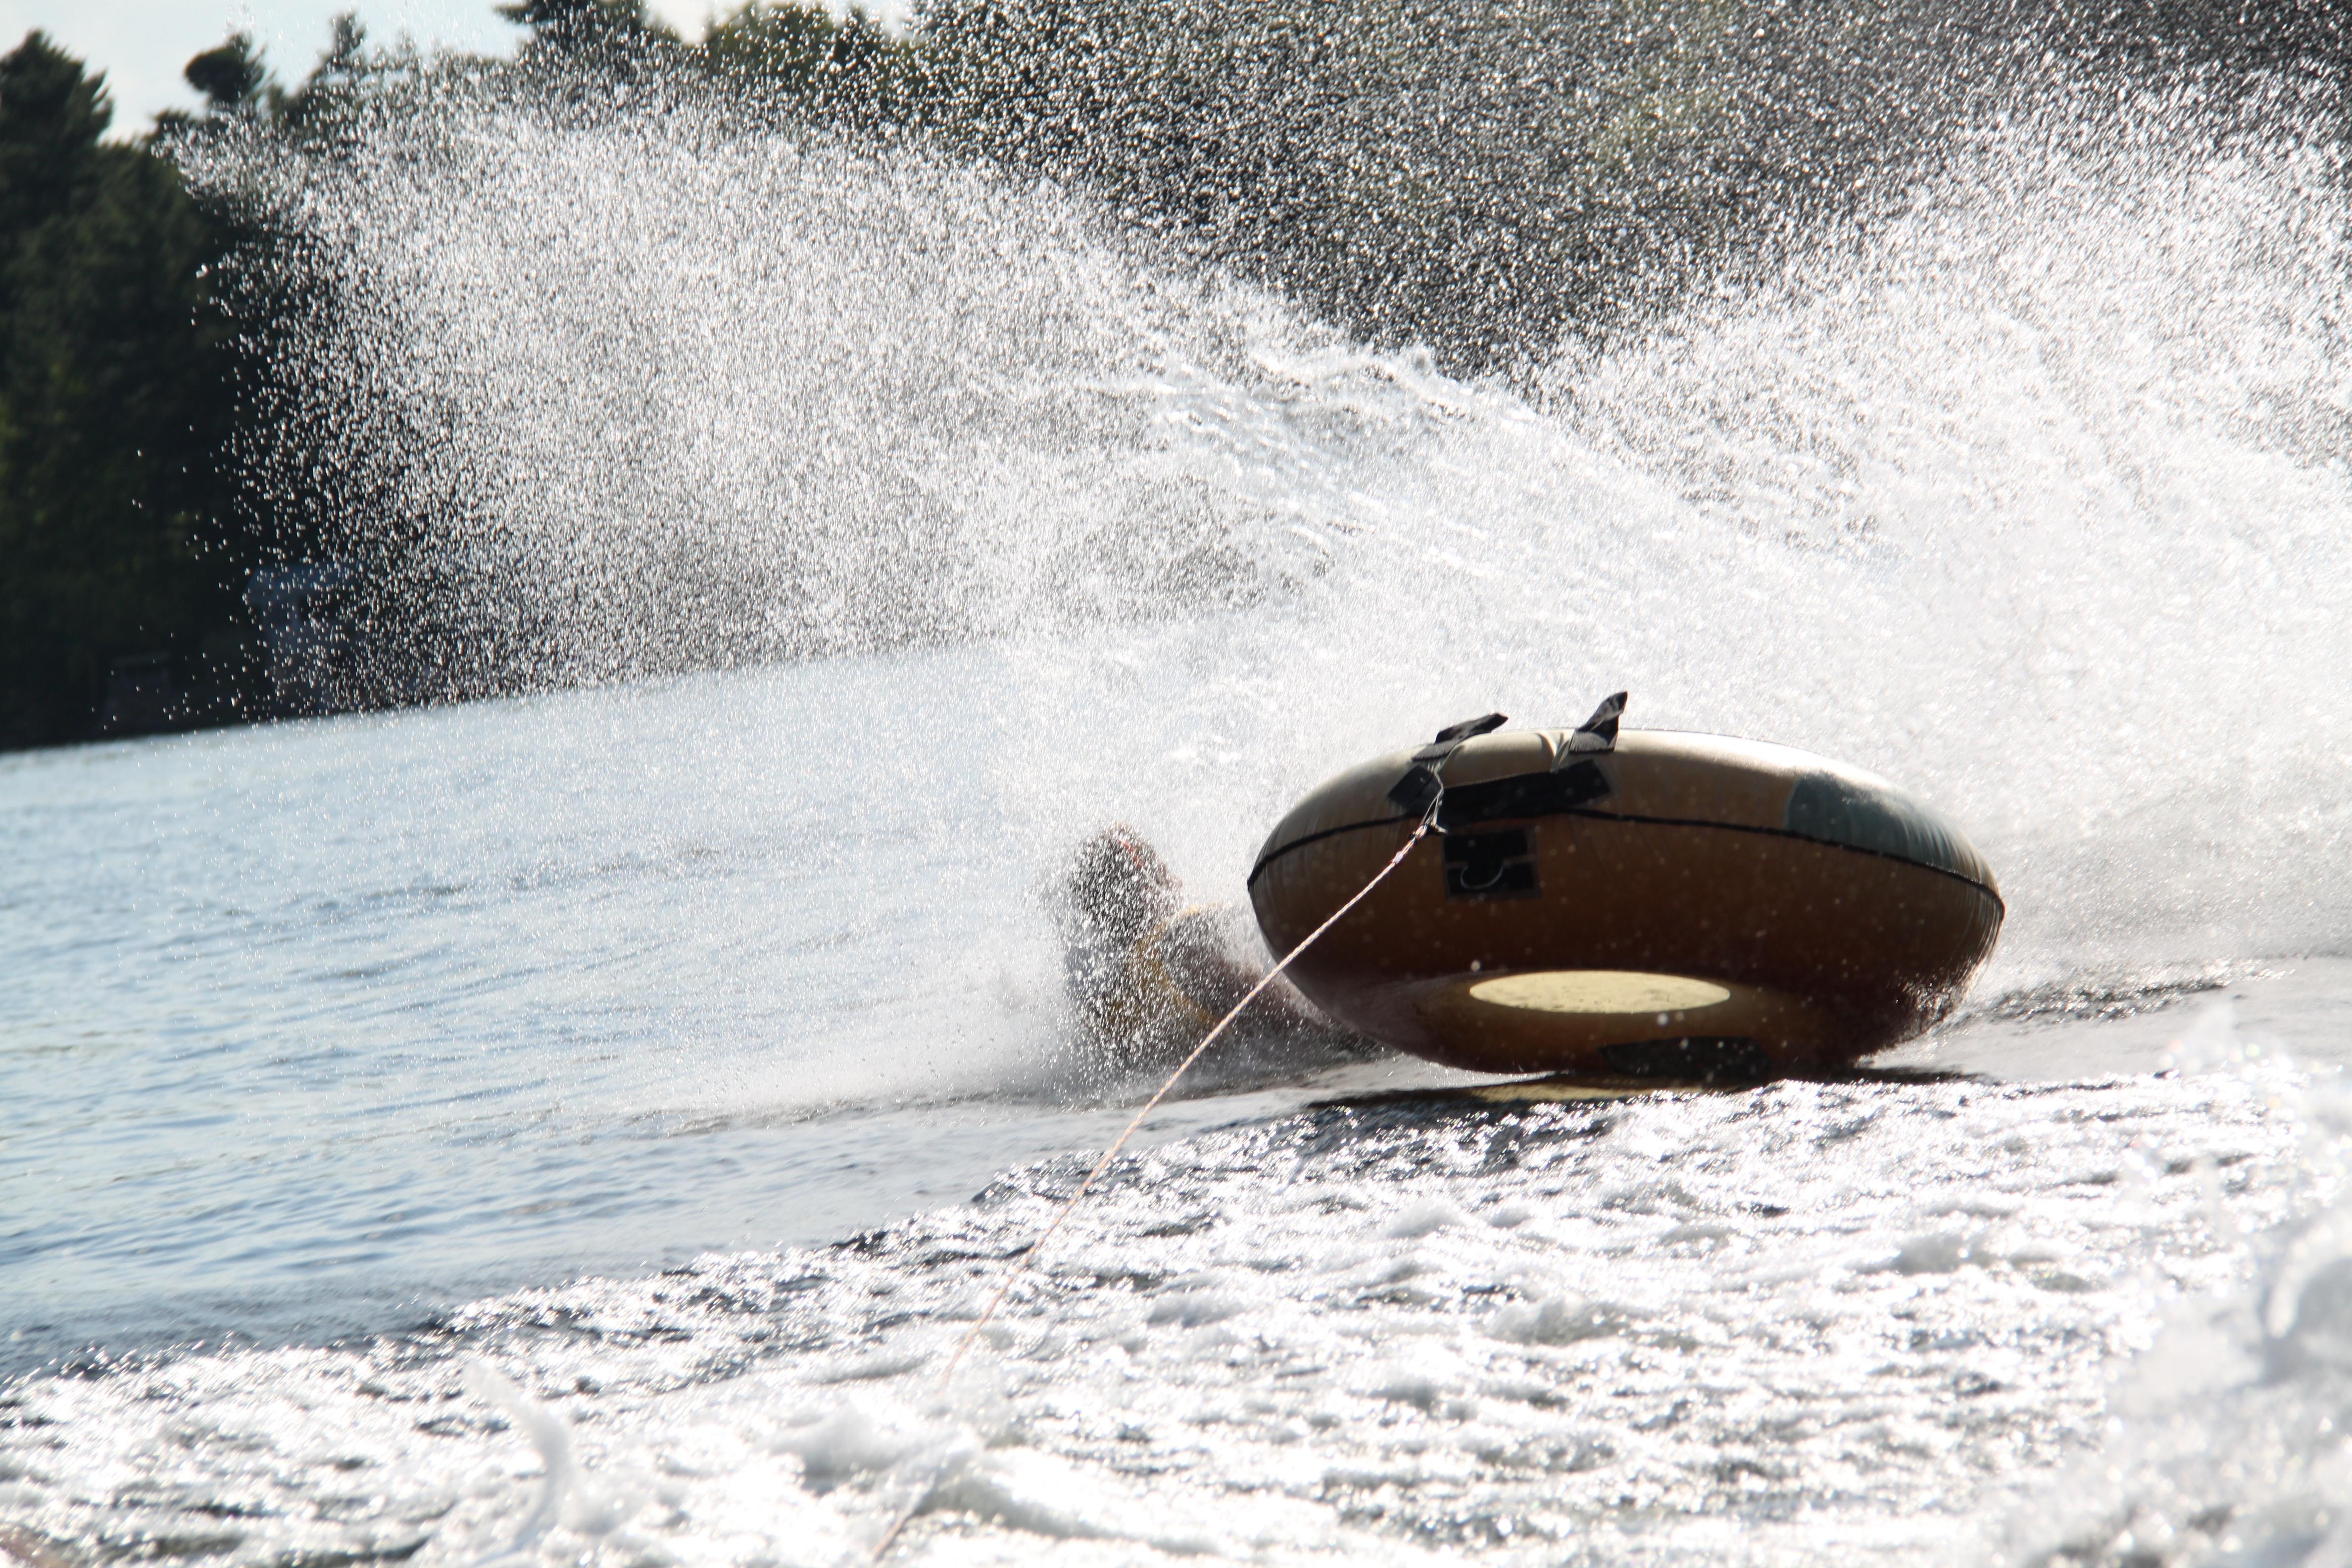 Tuber getting dunked in Charleston Lake, Ontario.